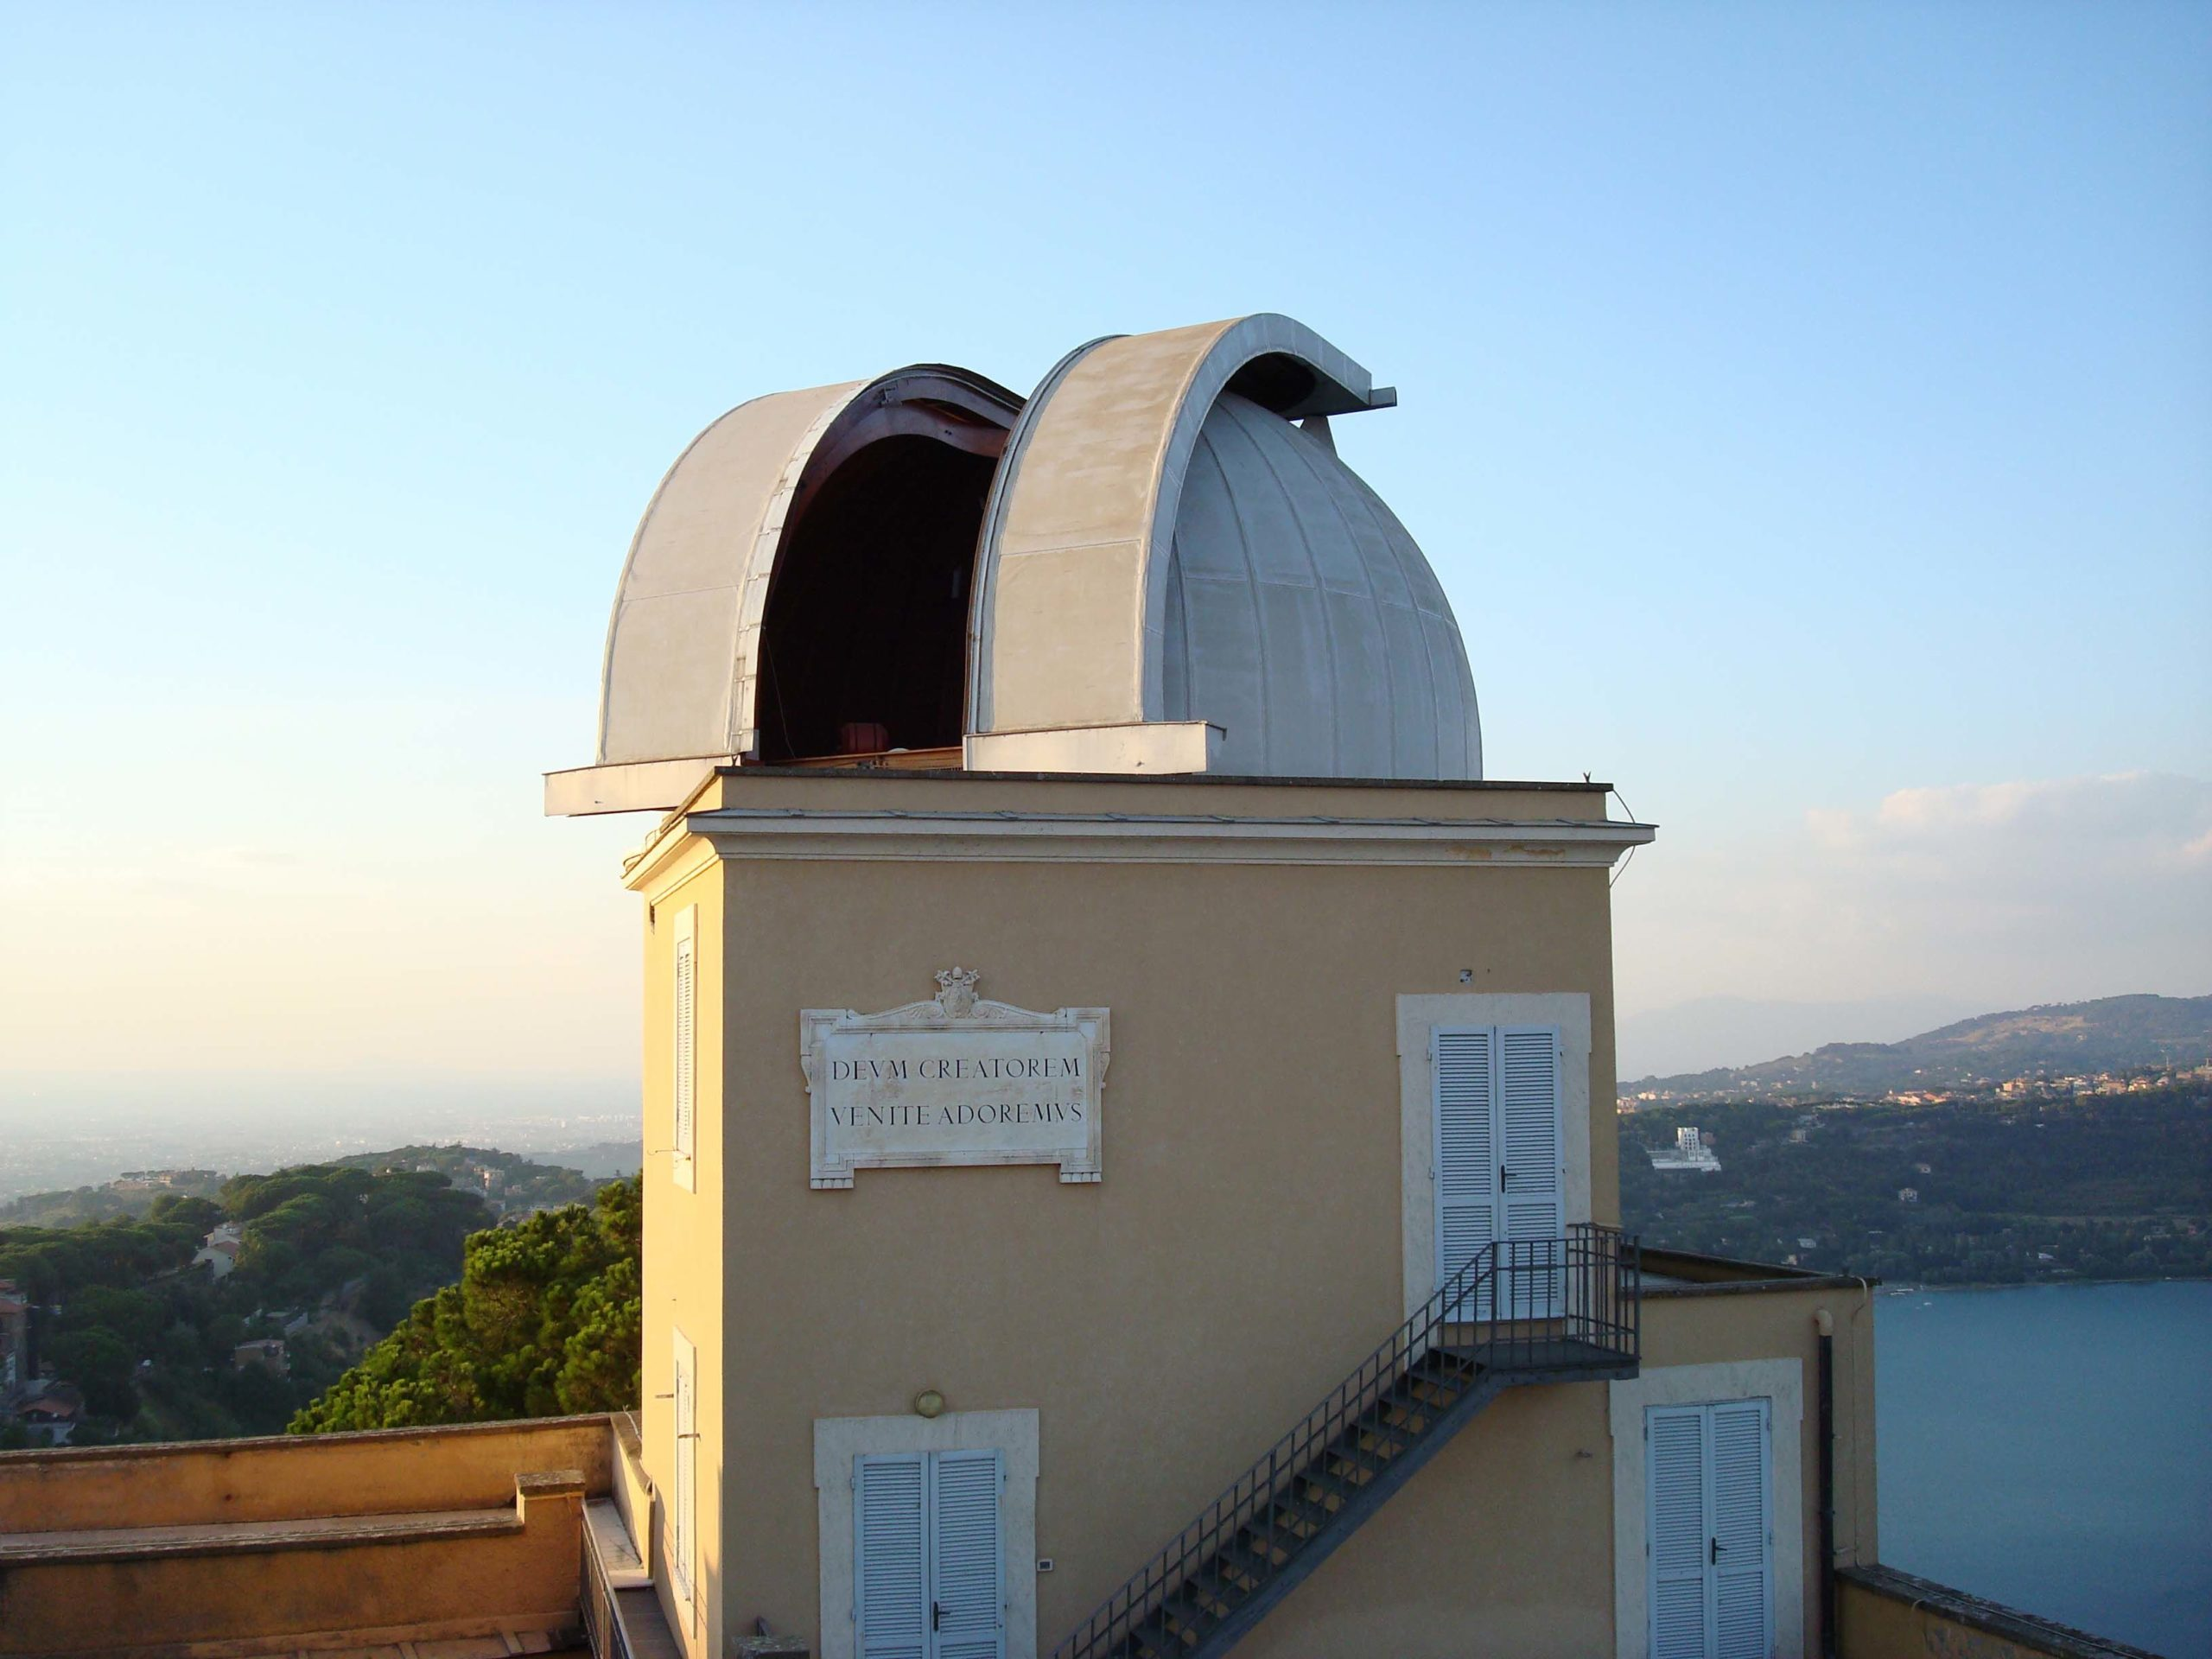 Double Astrograph Open Dome at Castel Gandolfo